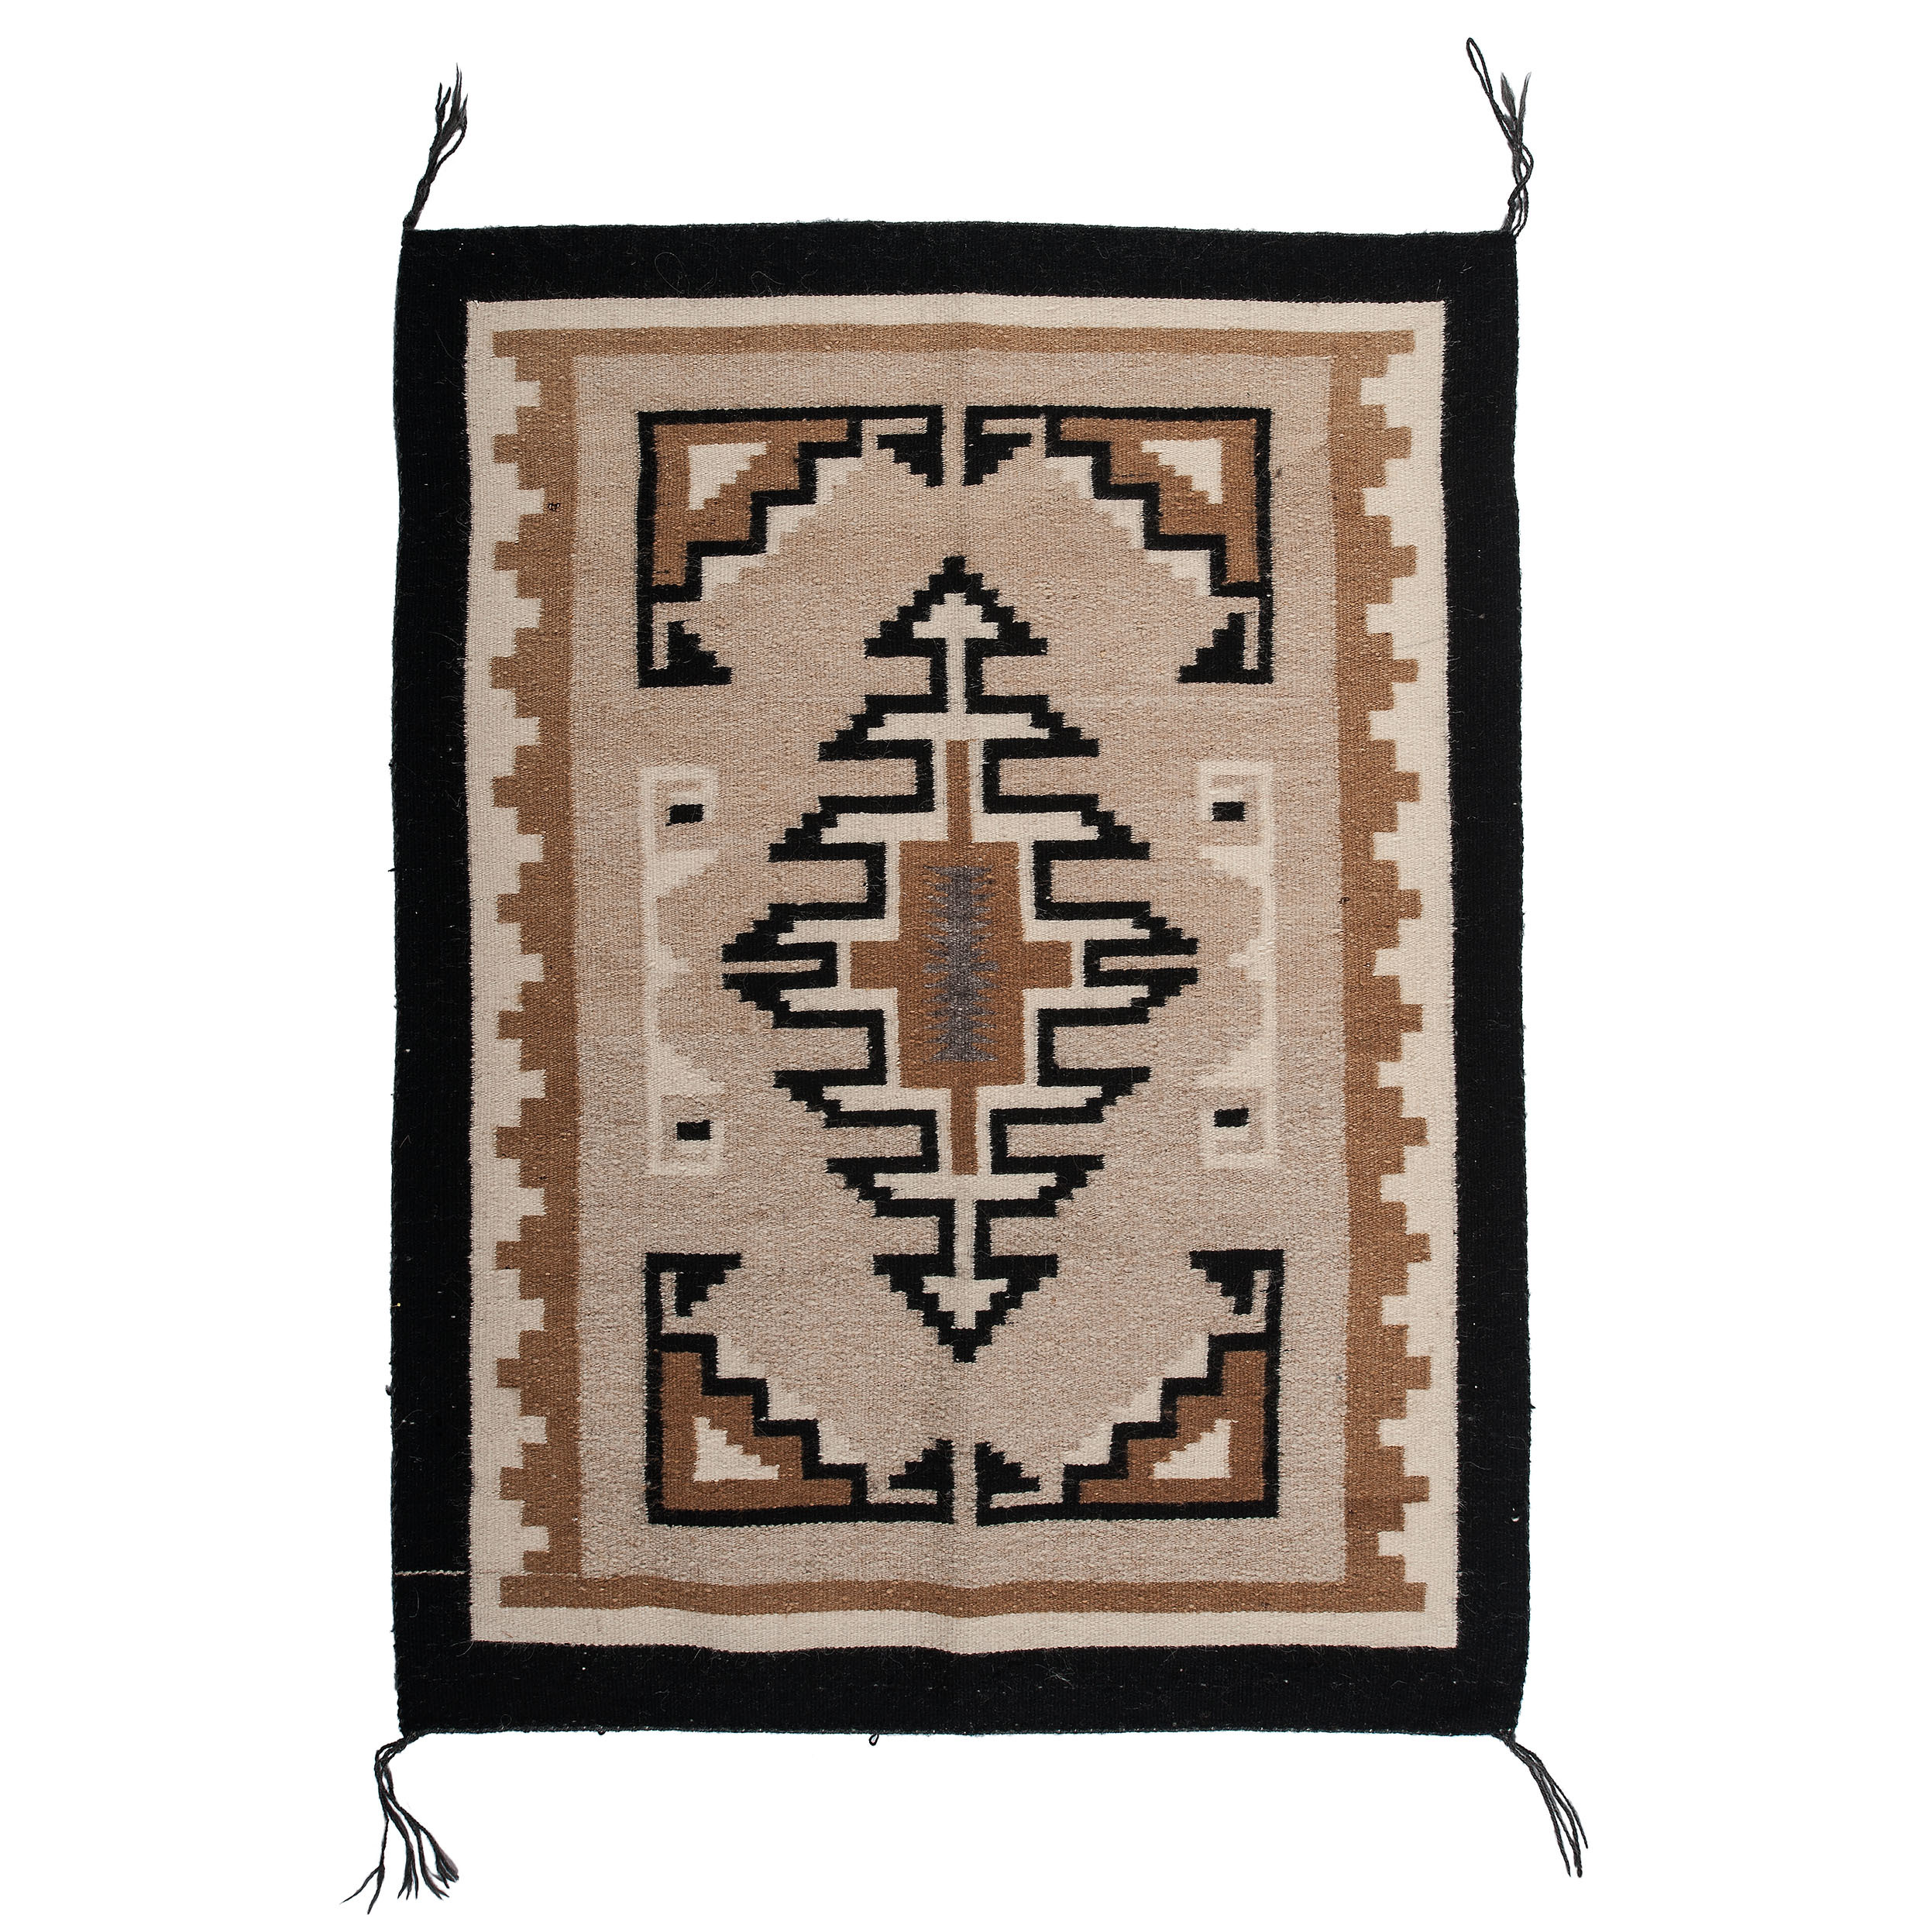 Navajo Two Grey Hills Weaving Rug Cowan S Auction